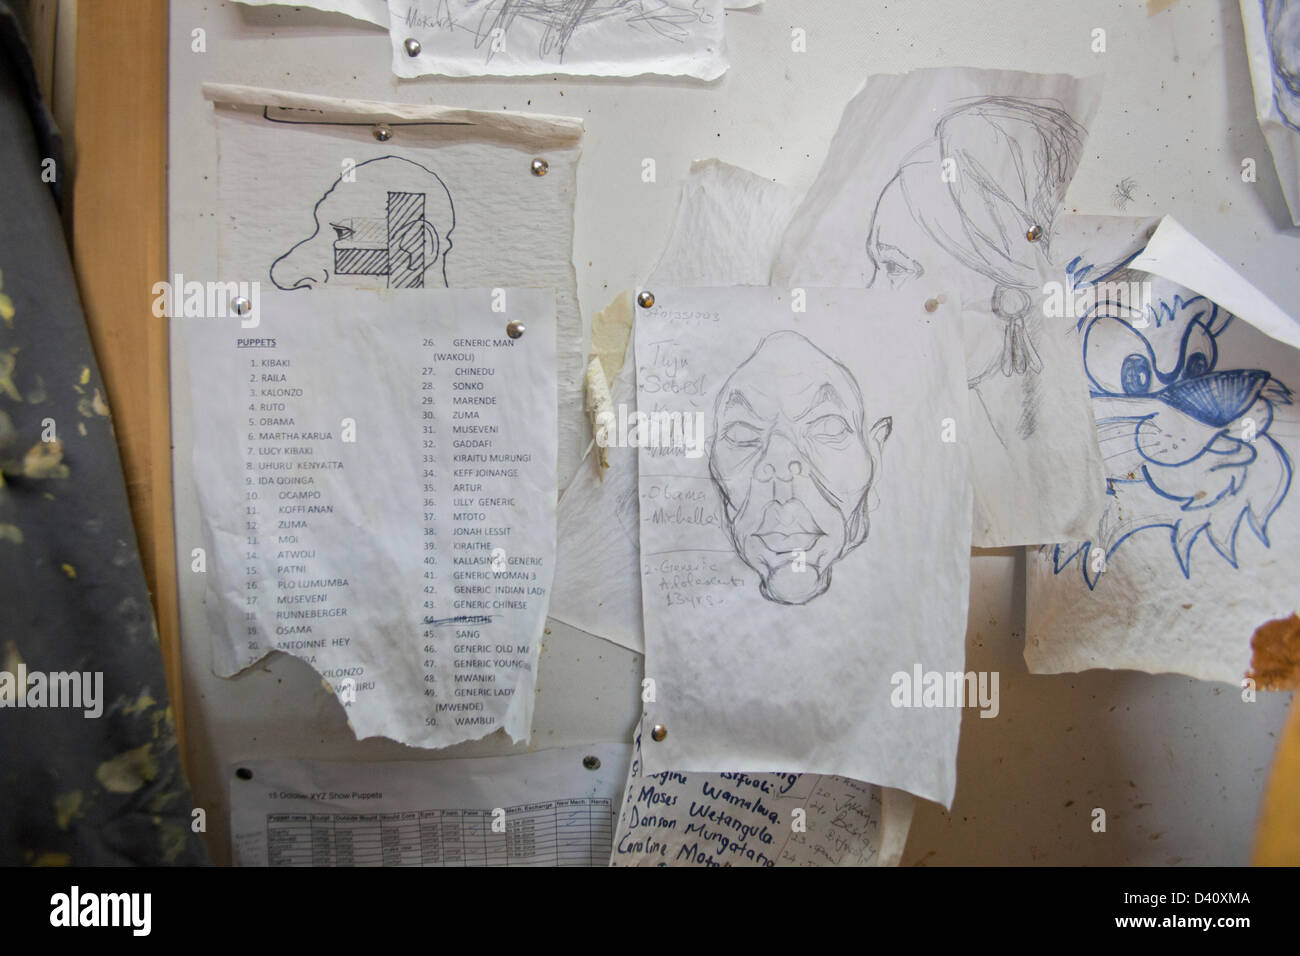 Nairobi, Kenya. 26th Feb 2013. Behind the scenes of Kenya's political satire 'The XYZ Show'. Caricature - Stock Image